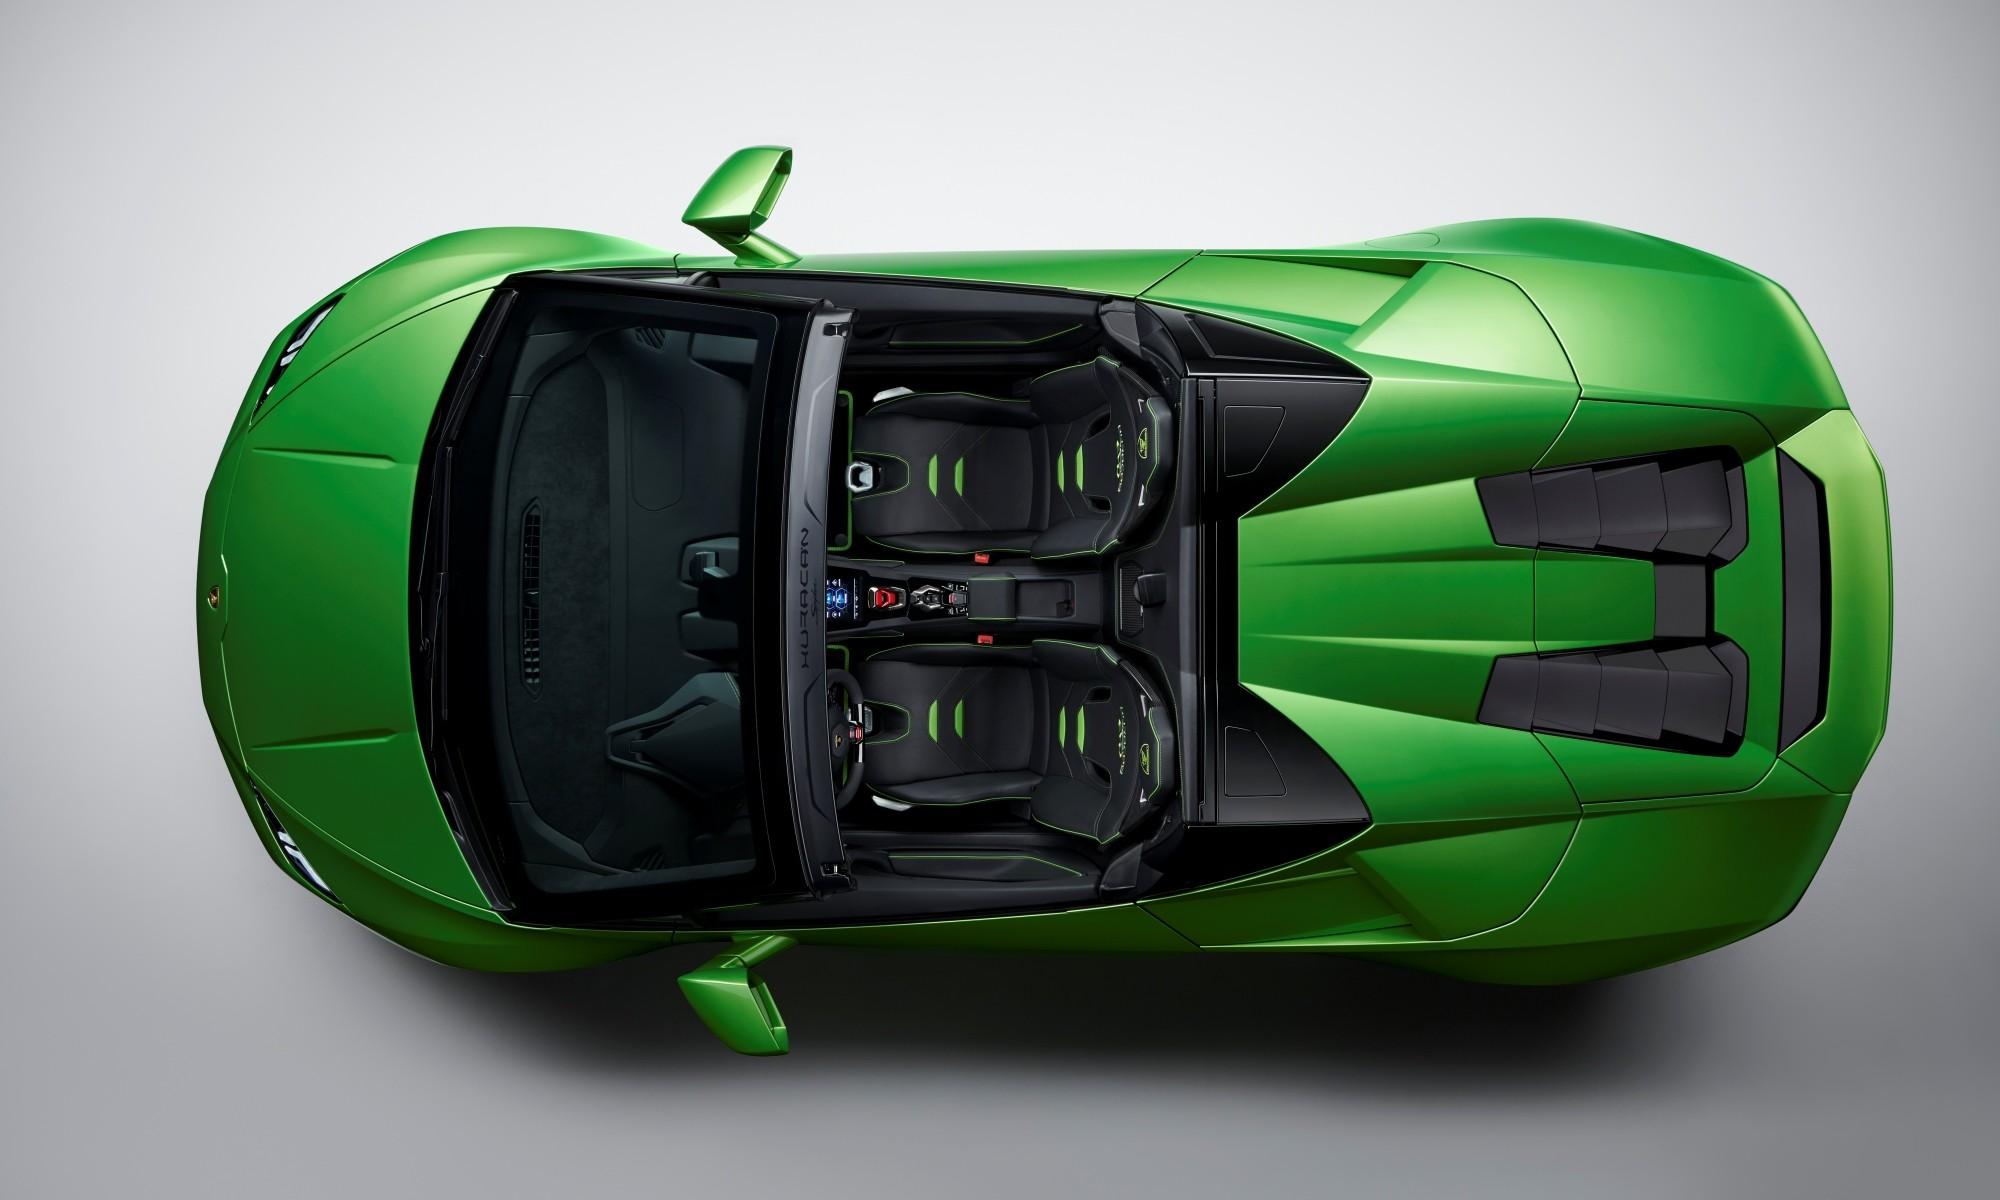 Lamborghini Huracan Evo Spyder overheadLamborghini Huracan Evo Spyder overhead